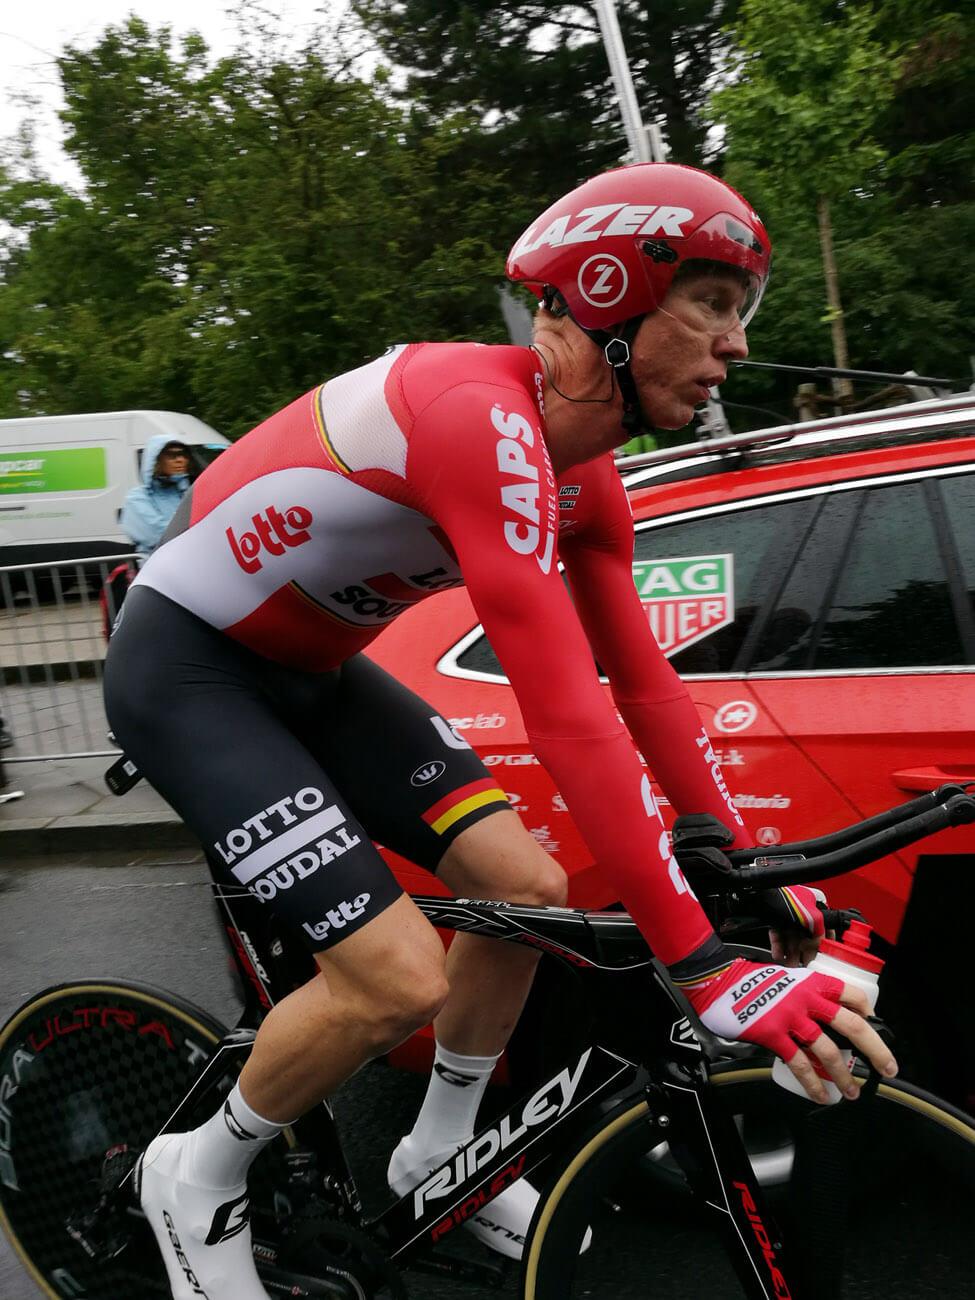 Marcel Sieberg Tour de France Düsseldorf